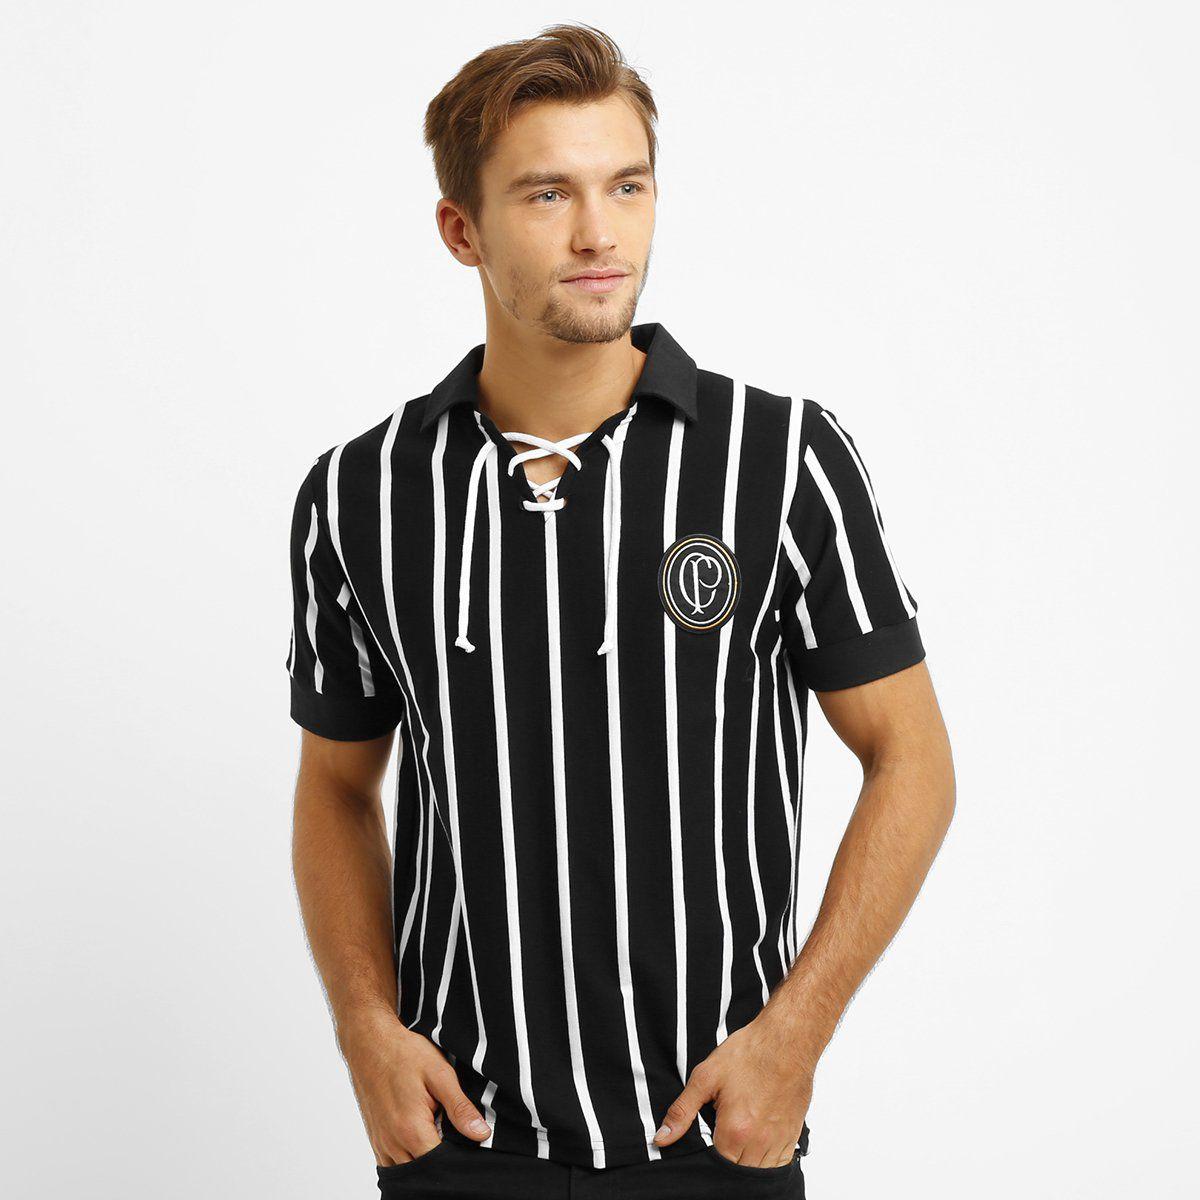 Camiseta Retrô Corinthians Réplica 1915 Masculina